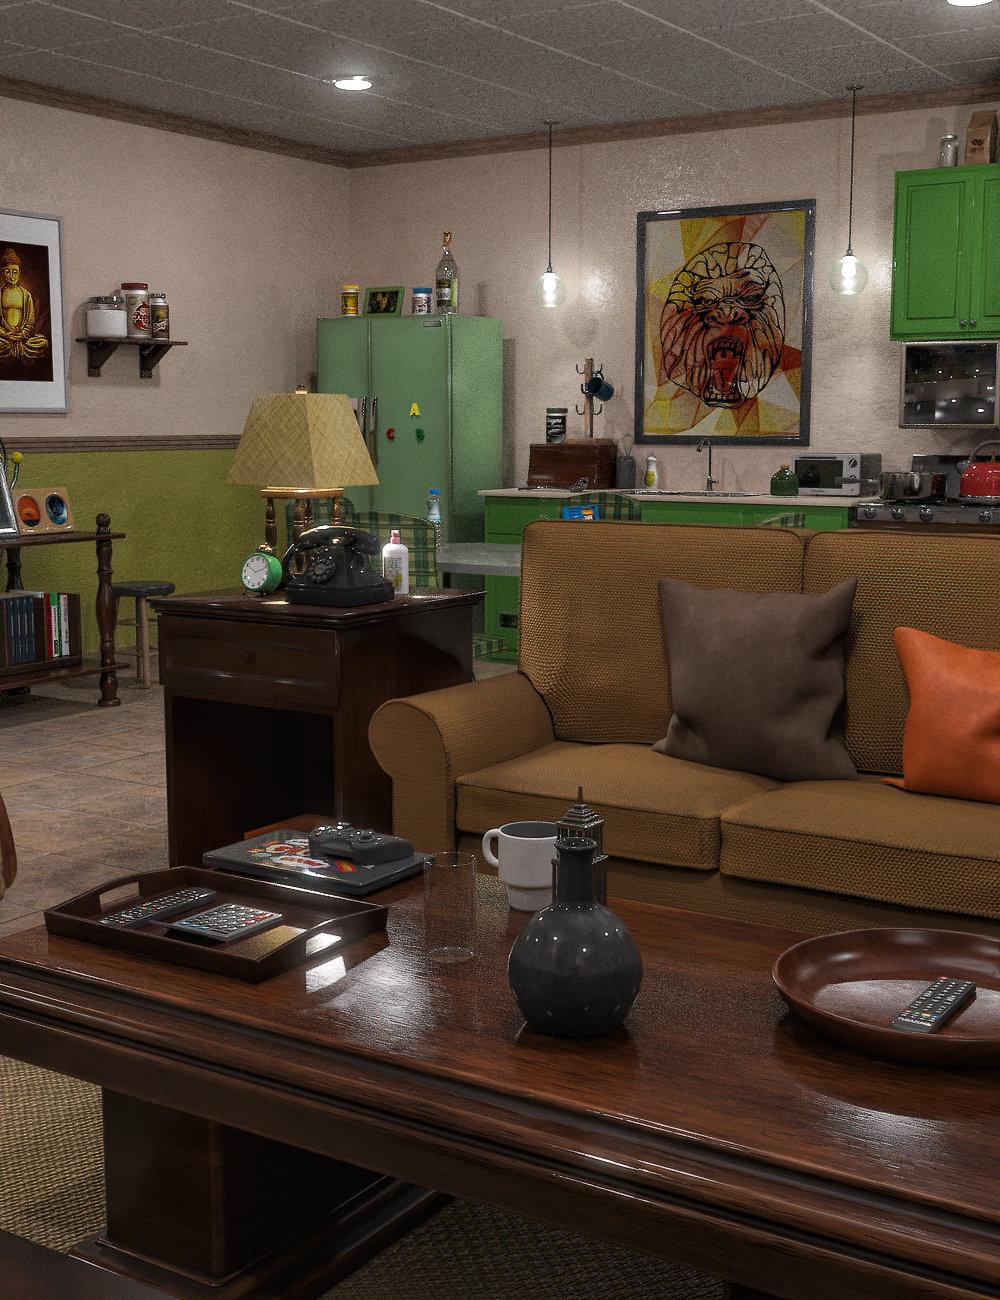 FG Messy Apartment by: Fugazi1968Ironman, 3D Models by Daz 3D